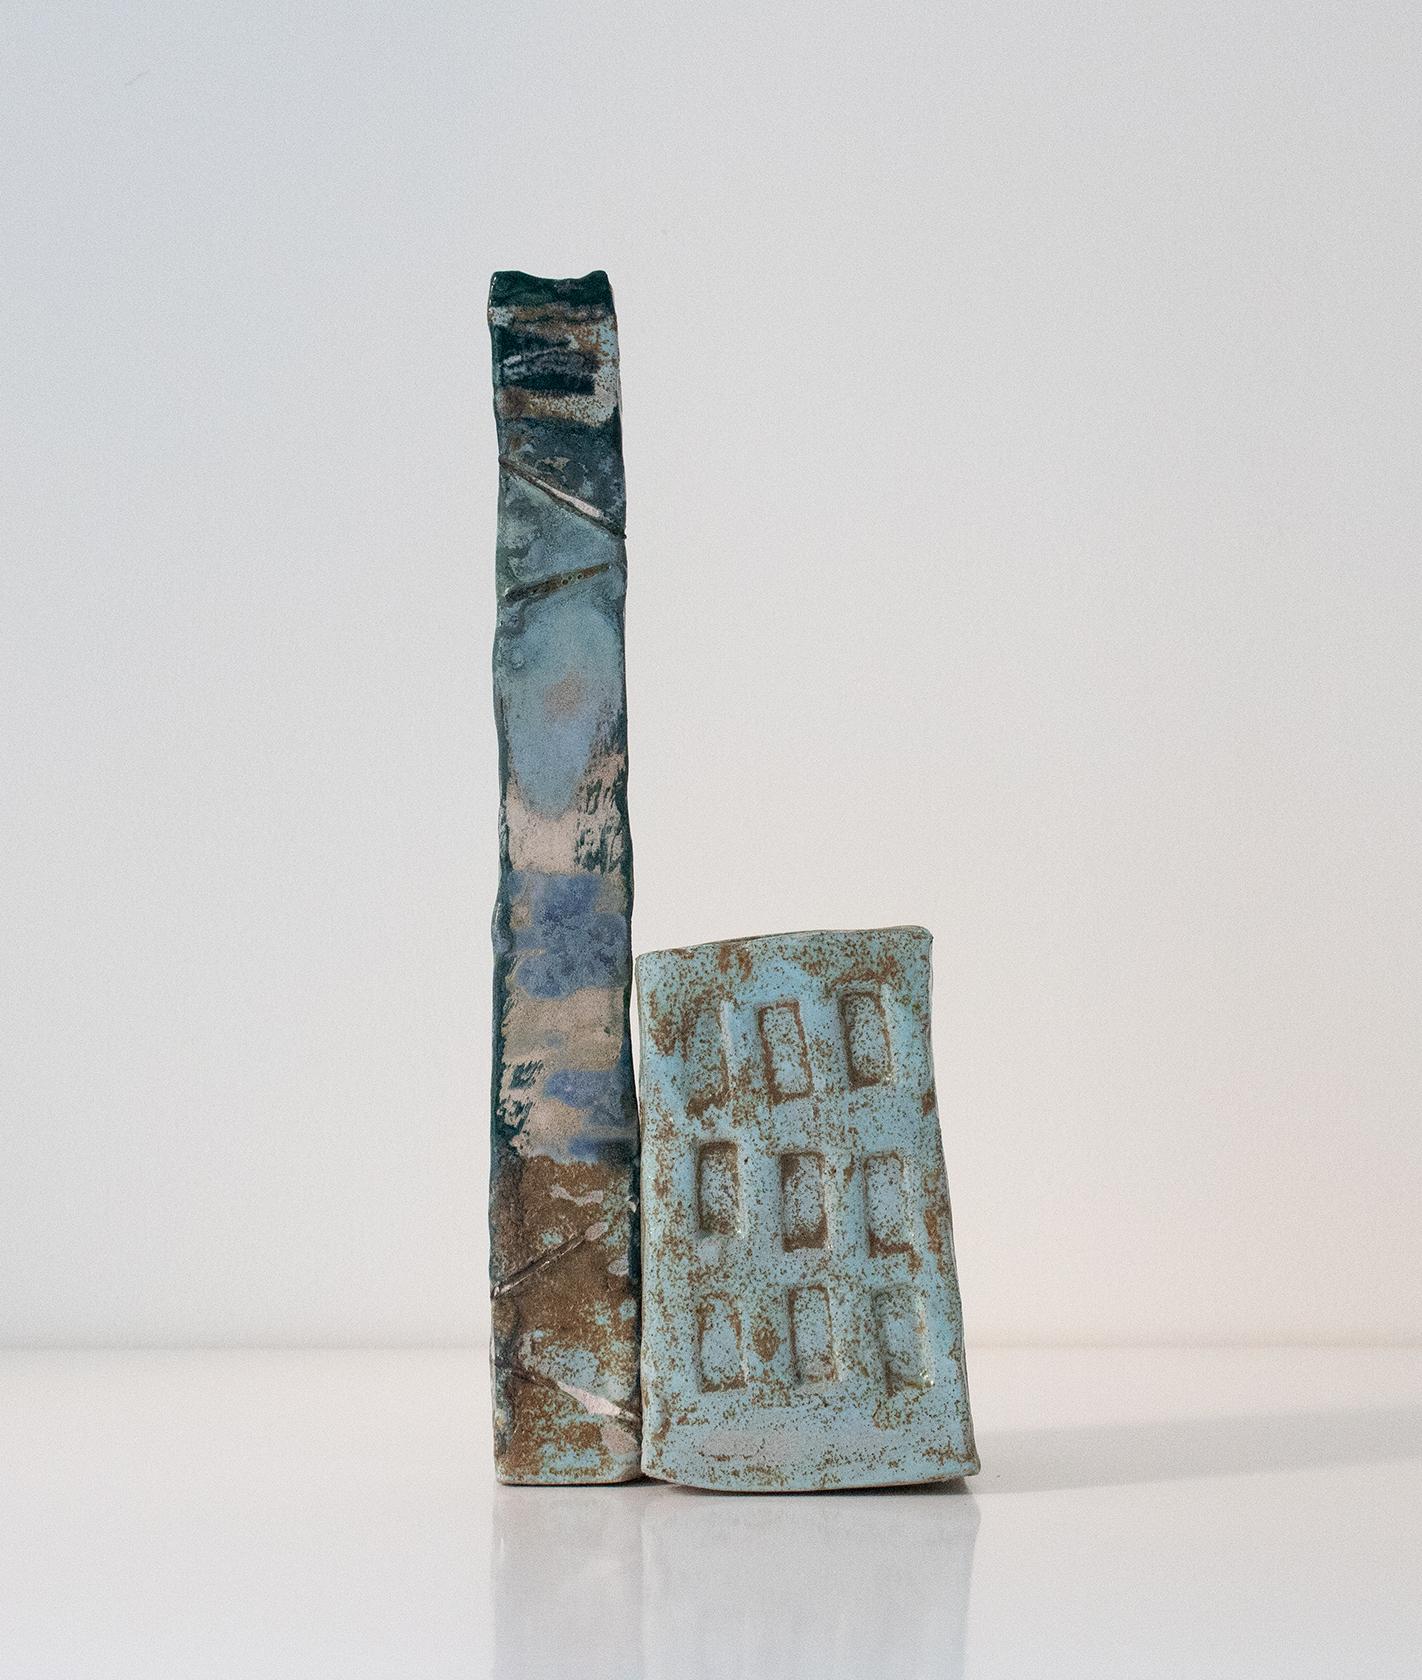 Fabrik_Keramik, Glasur_27,5 x 11 x 7 cm_2018